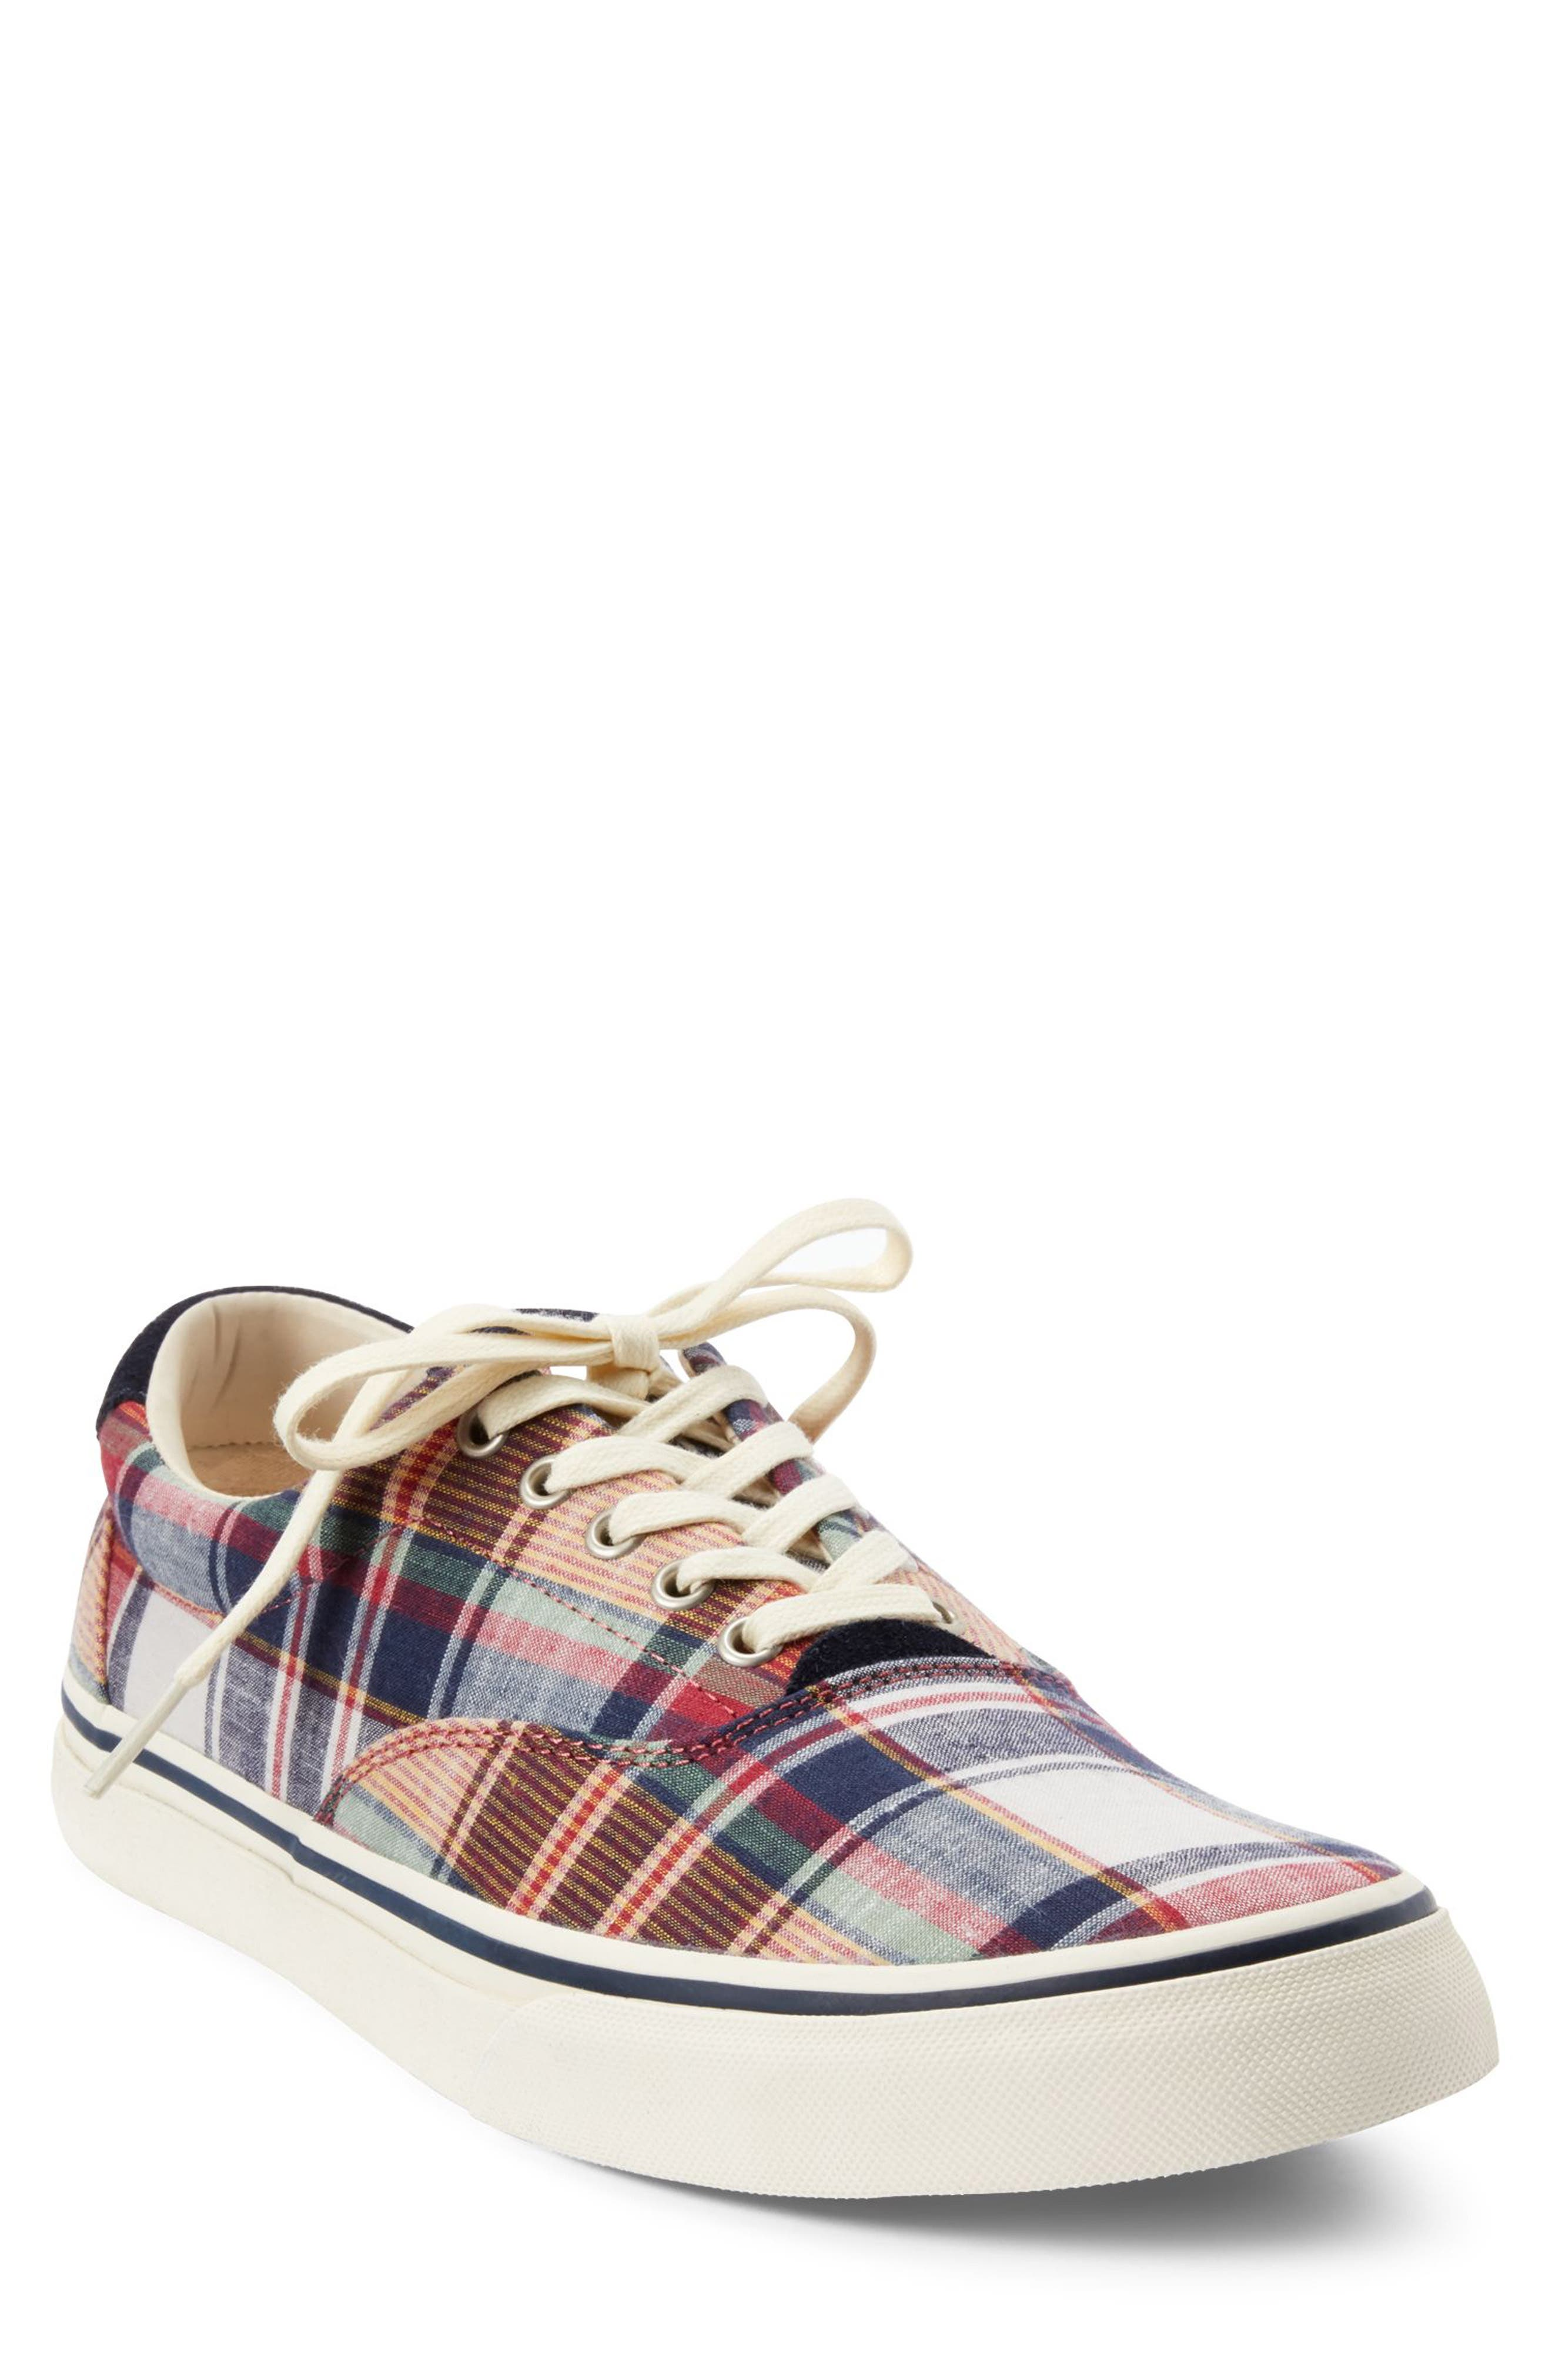 POLO RALPH LAUREN Thorton III Sneaker, Main, color, MULTI COLOR FABRIC